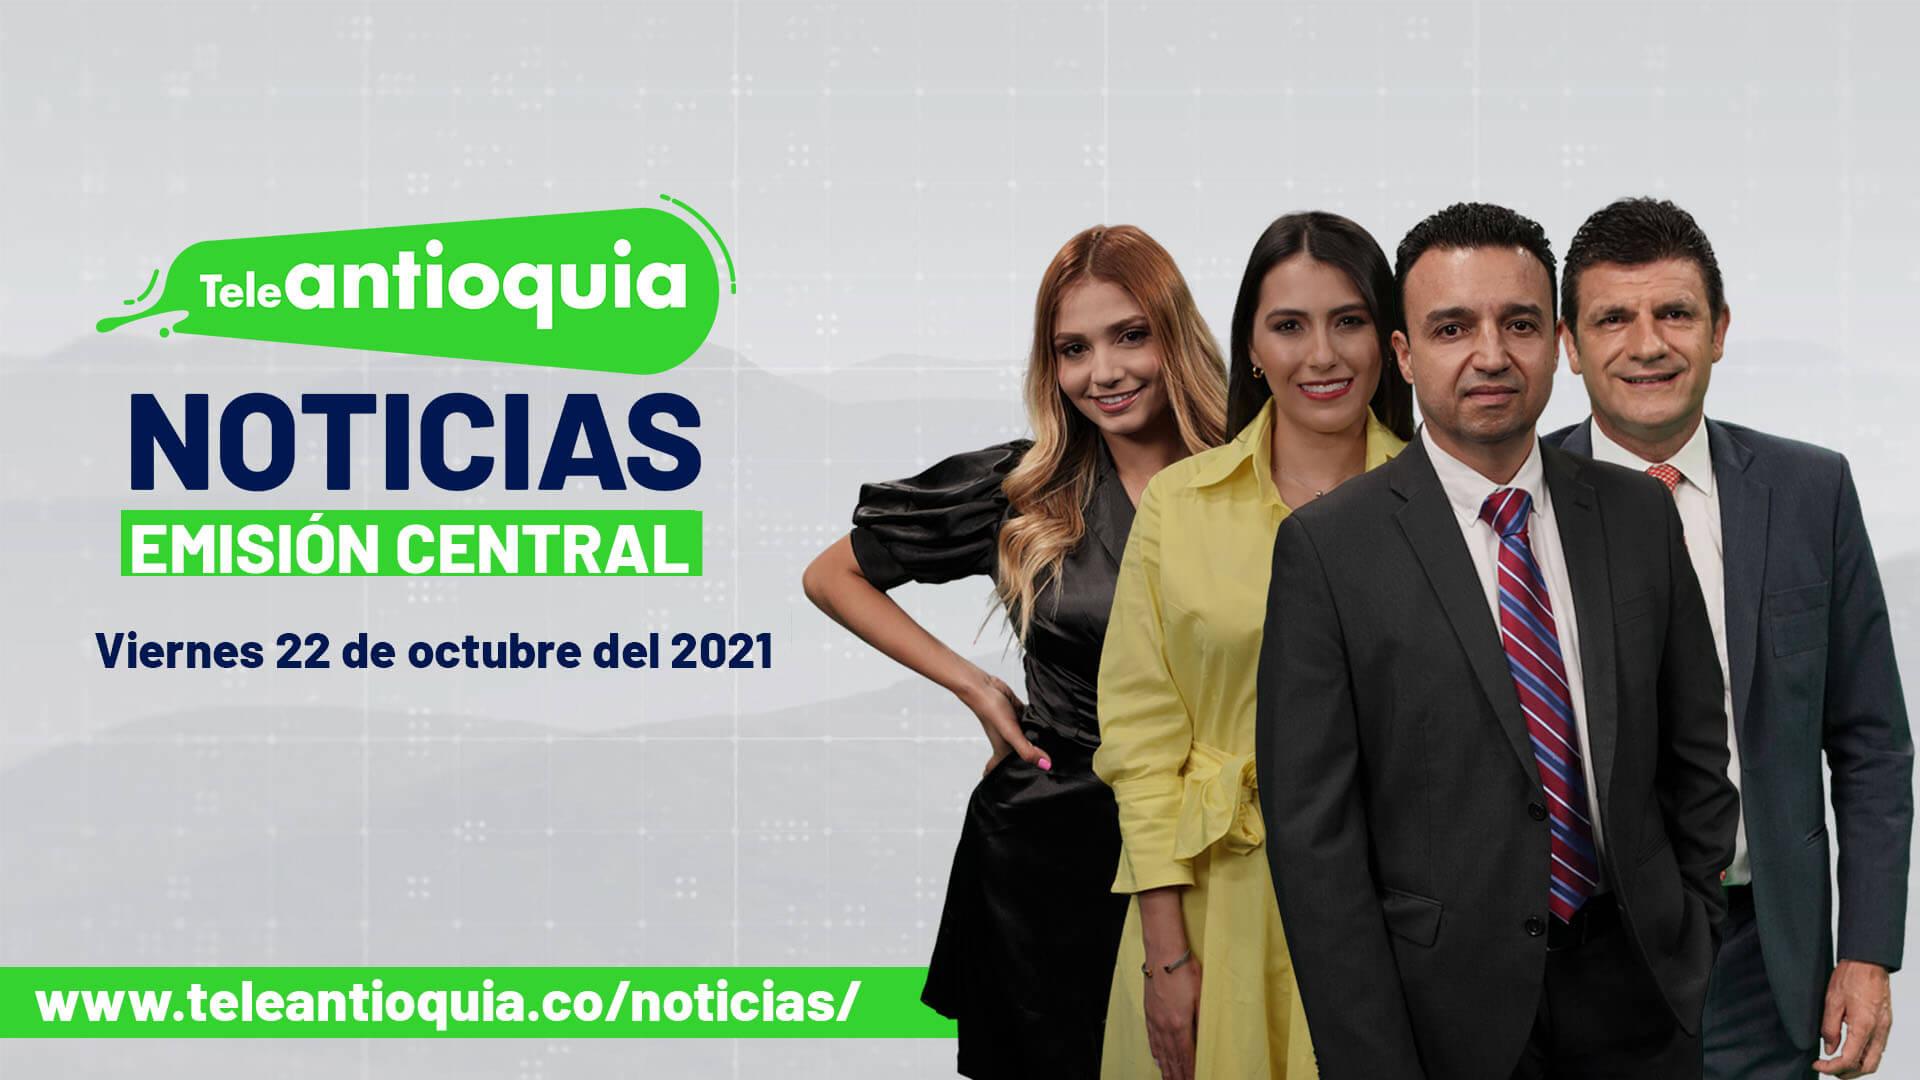 Teleantioquia Noticias – miércoles 23 de junio de 2021